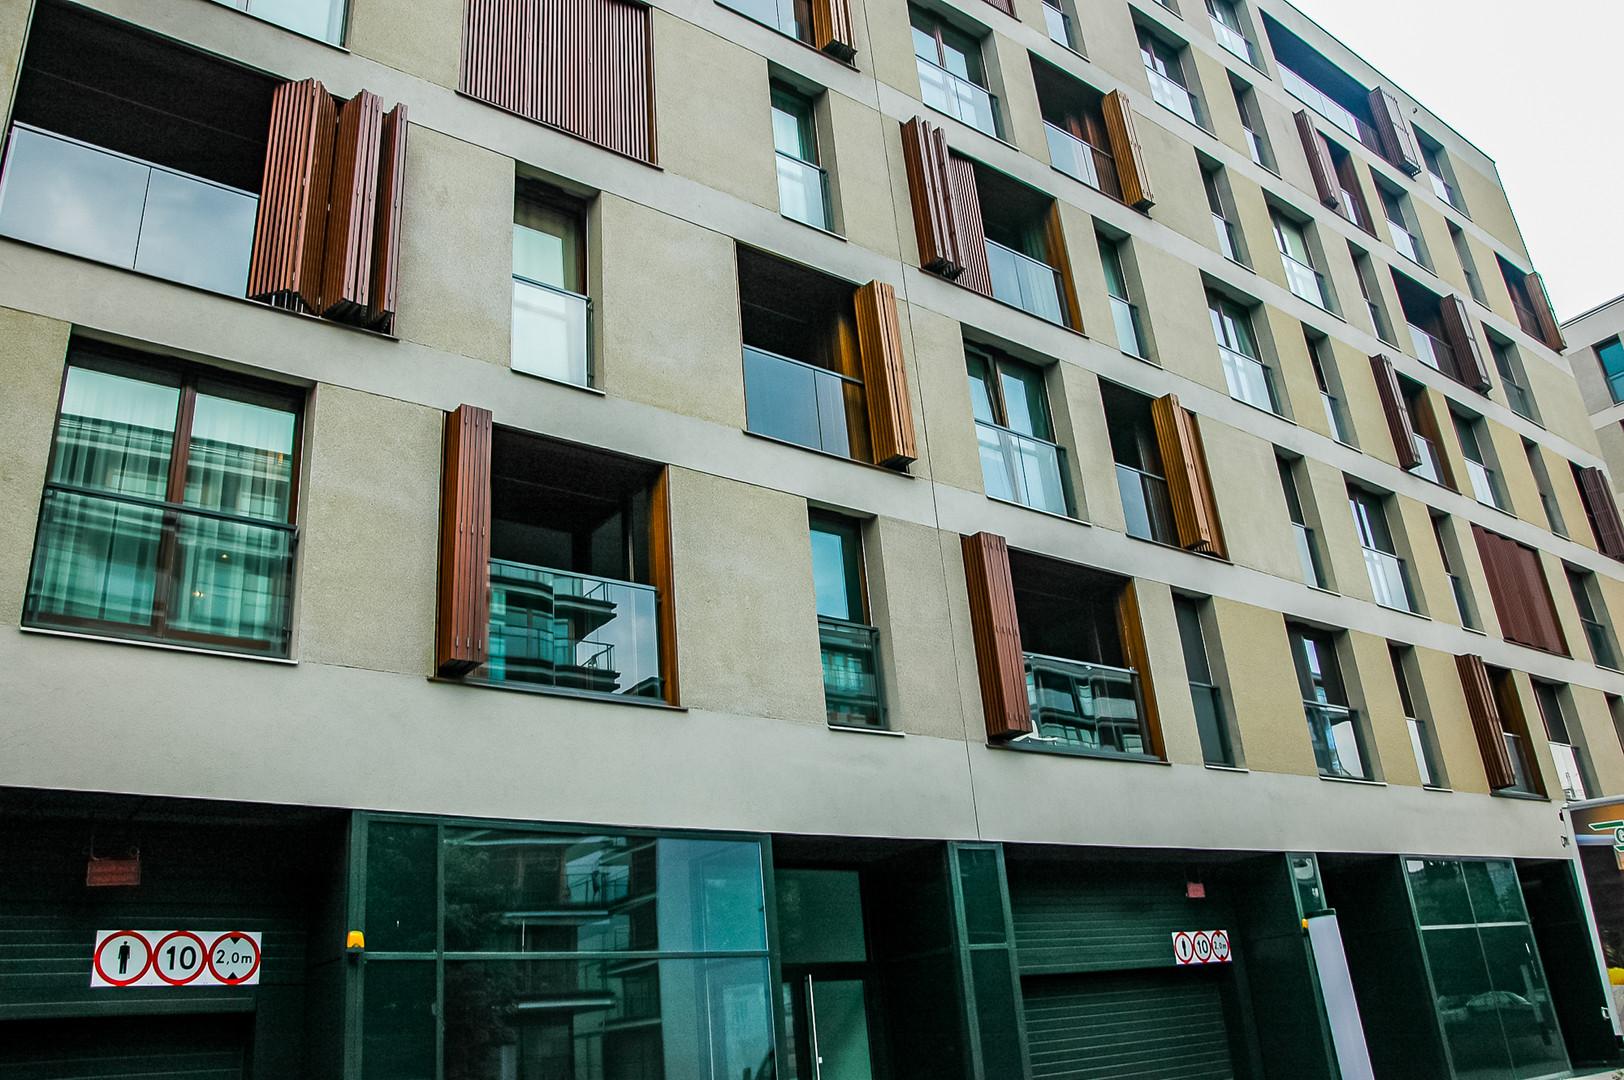 Apartments for rent Kolejowa_0826.jpg